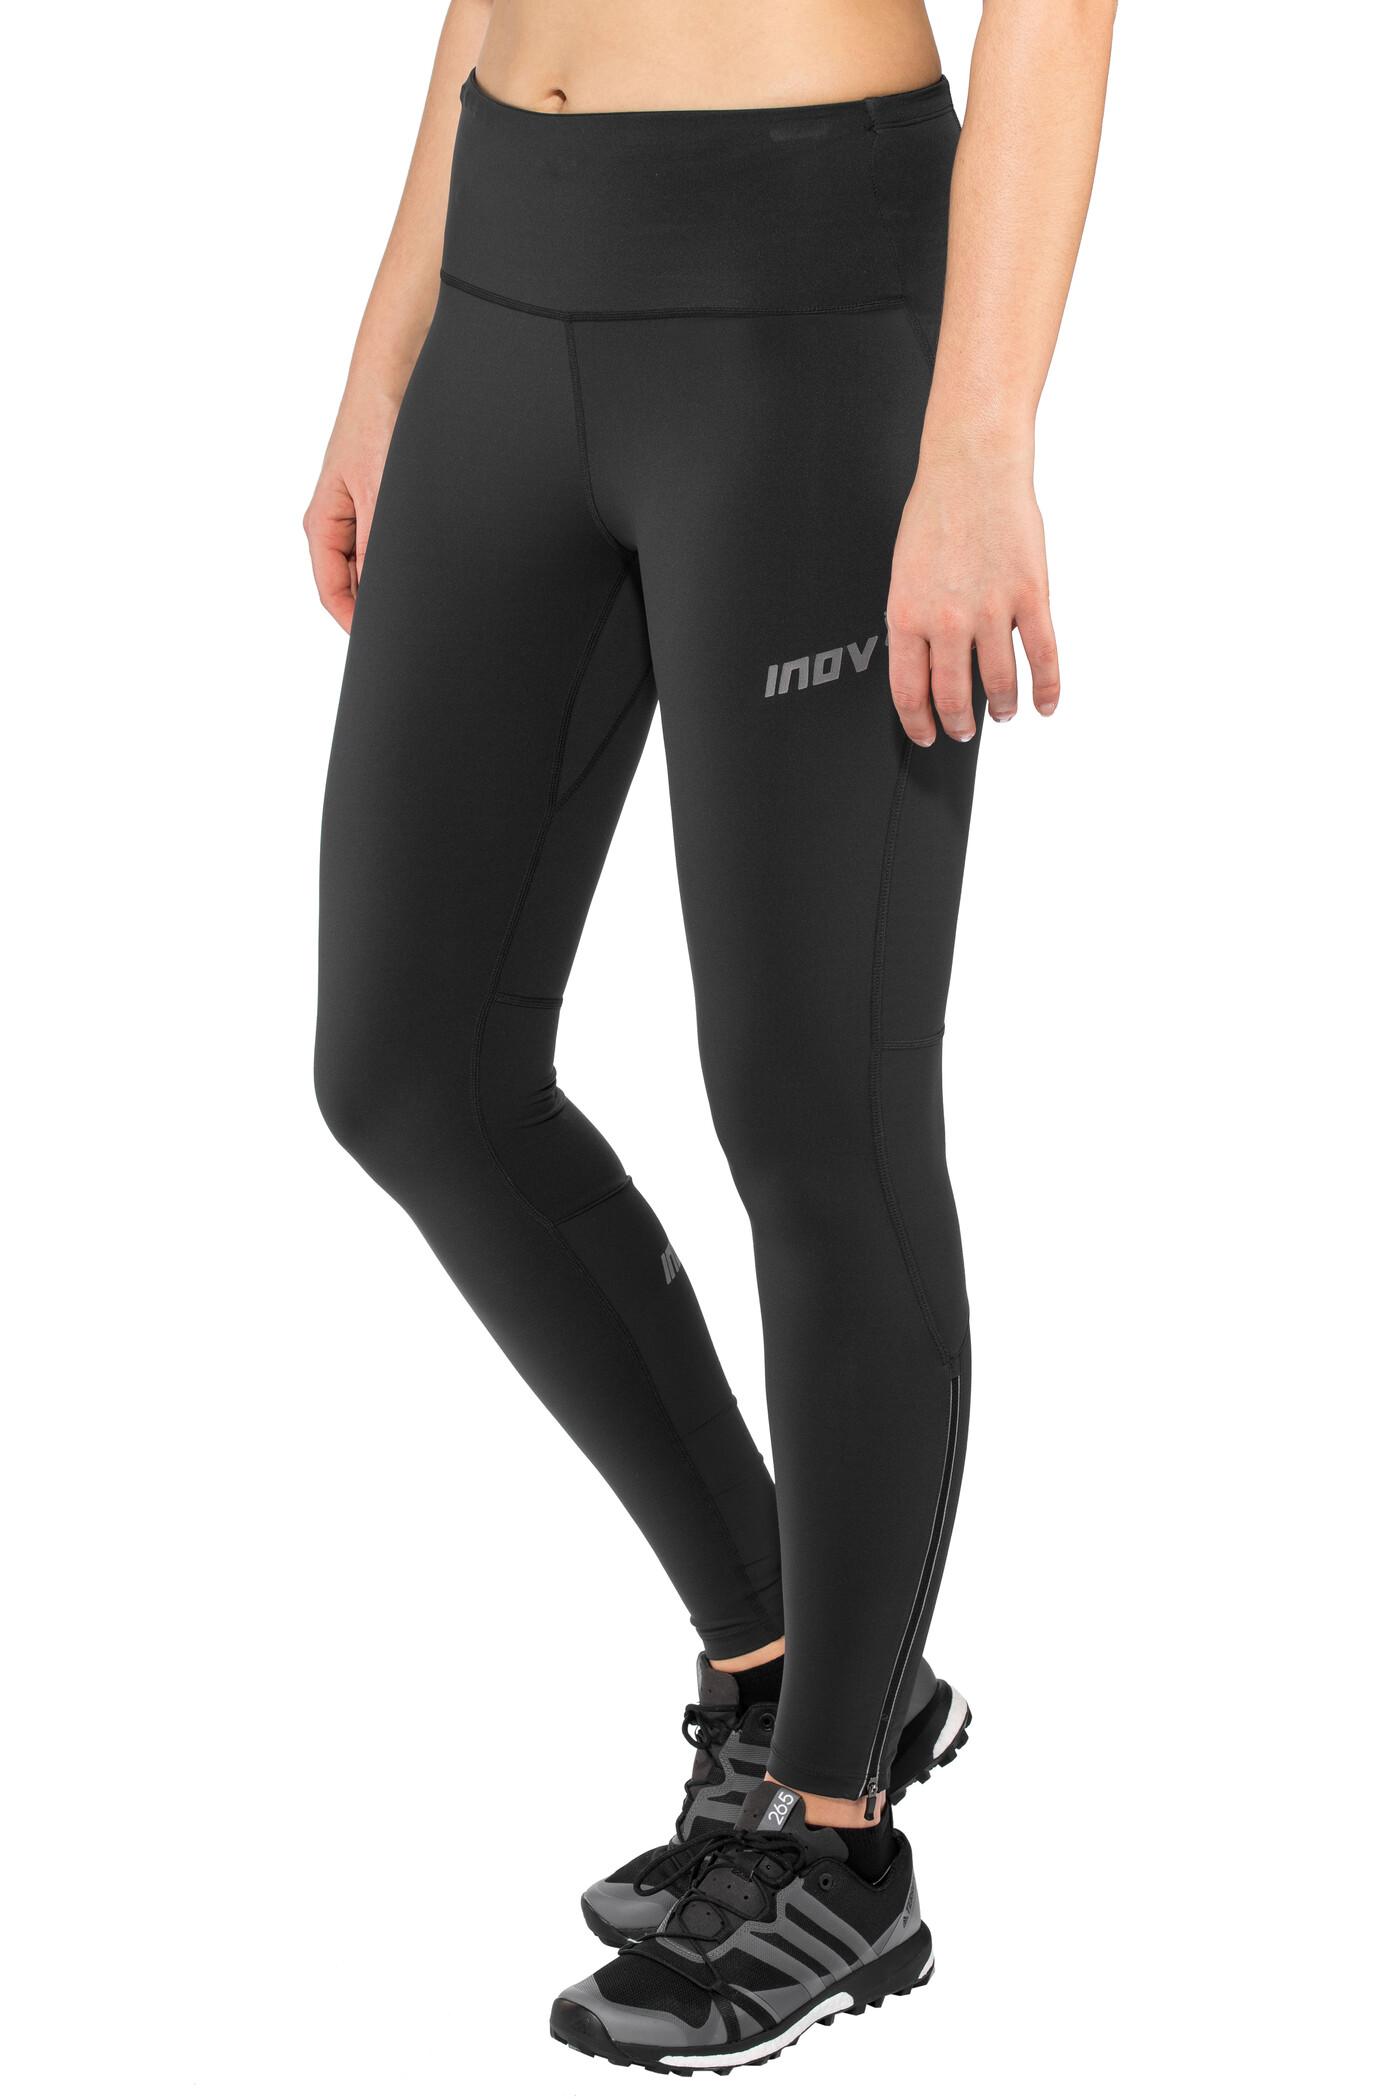 inov-8 Race Elite Tights Damer, black (2019)   Trousers